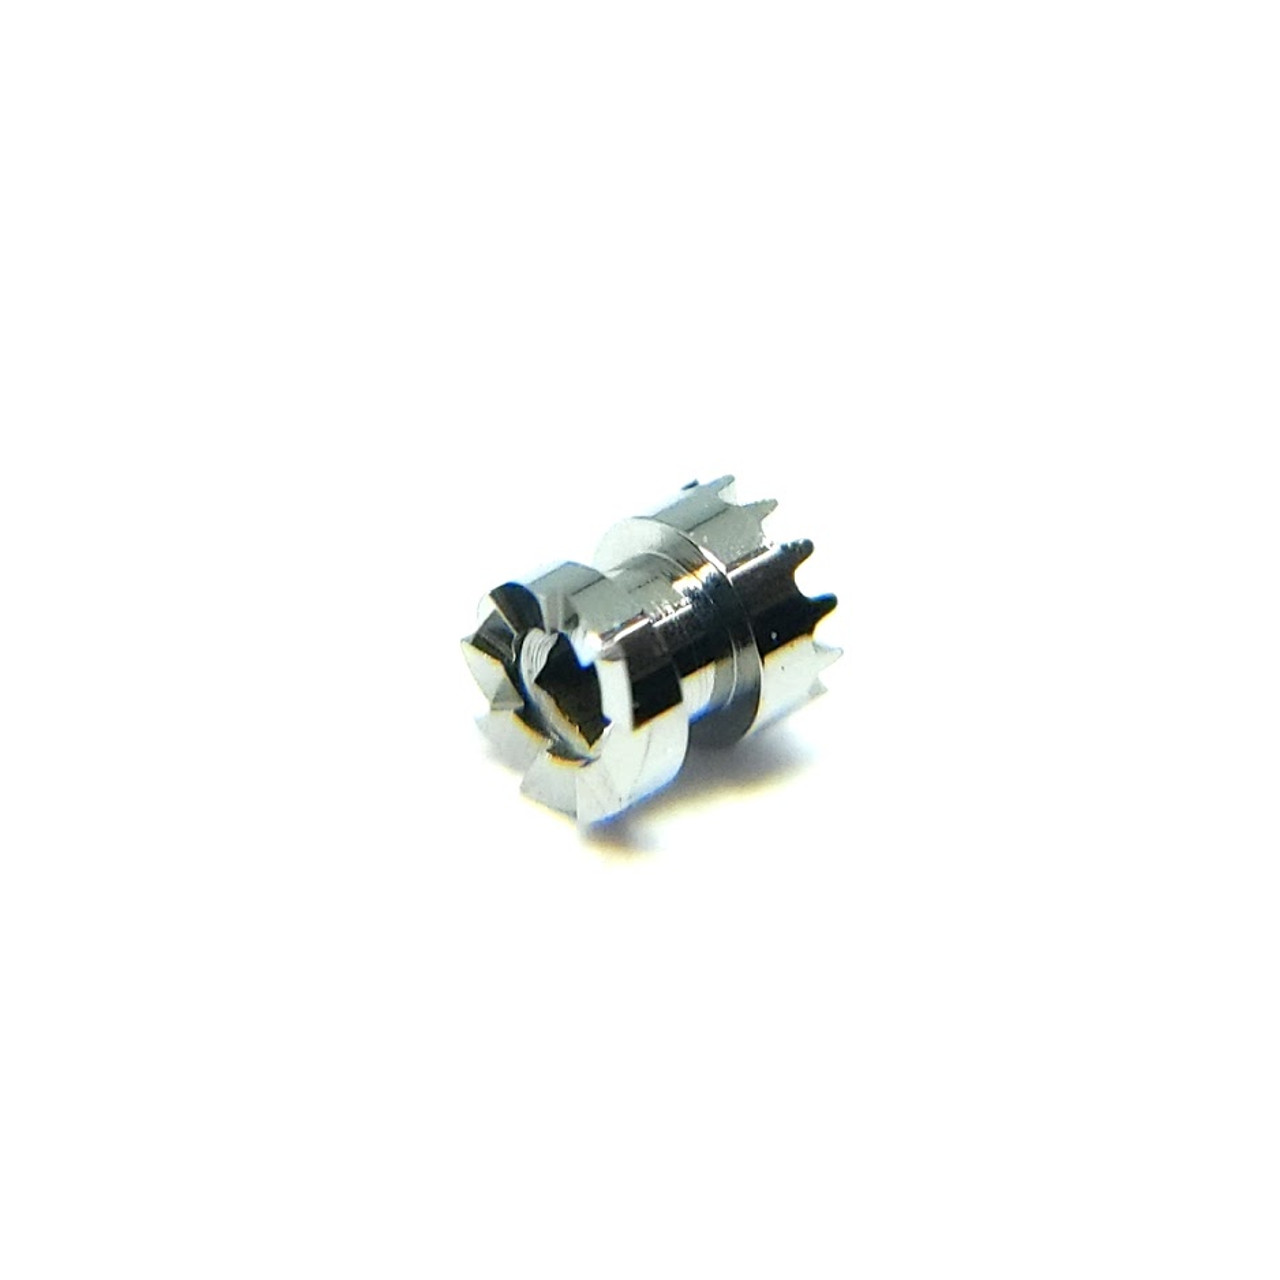 Generic Sliding Pinion Clutch Wheel for 3135 205